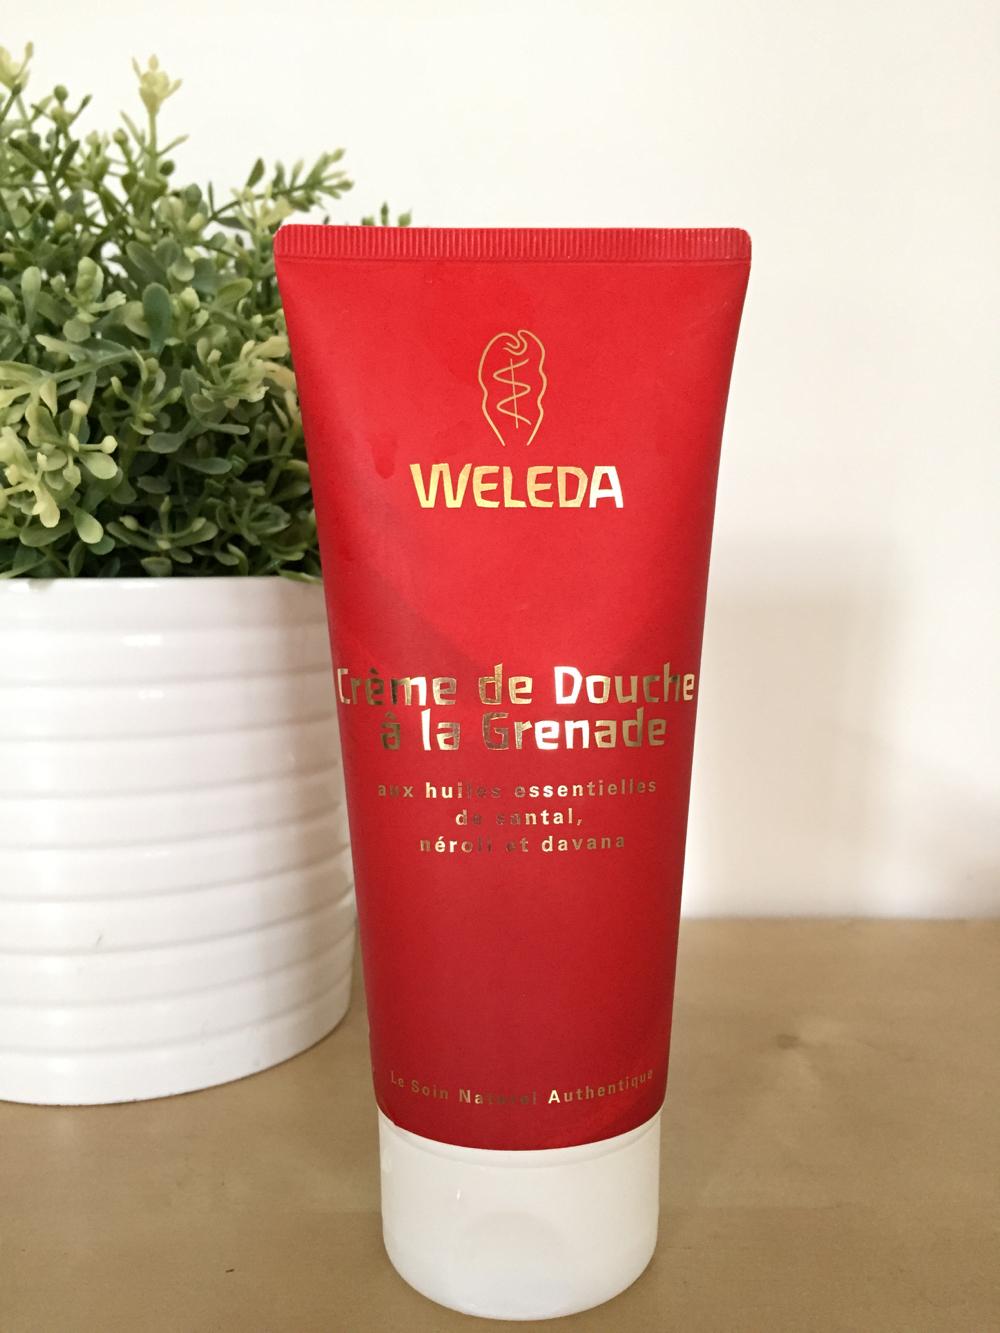 Creme Douche Grenade Weleda - 1